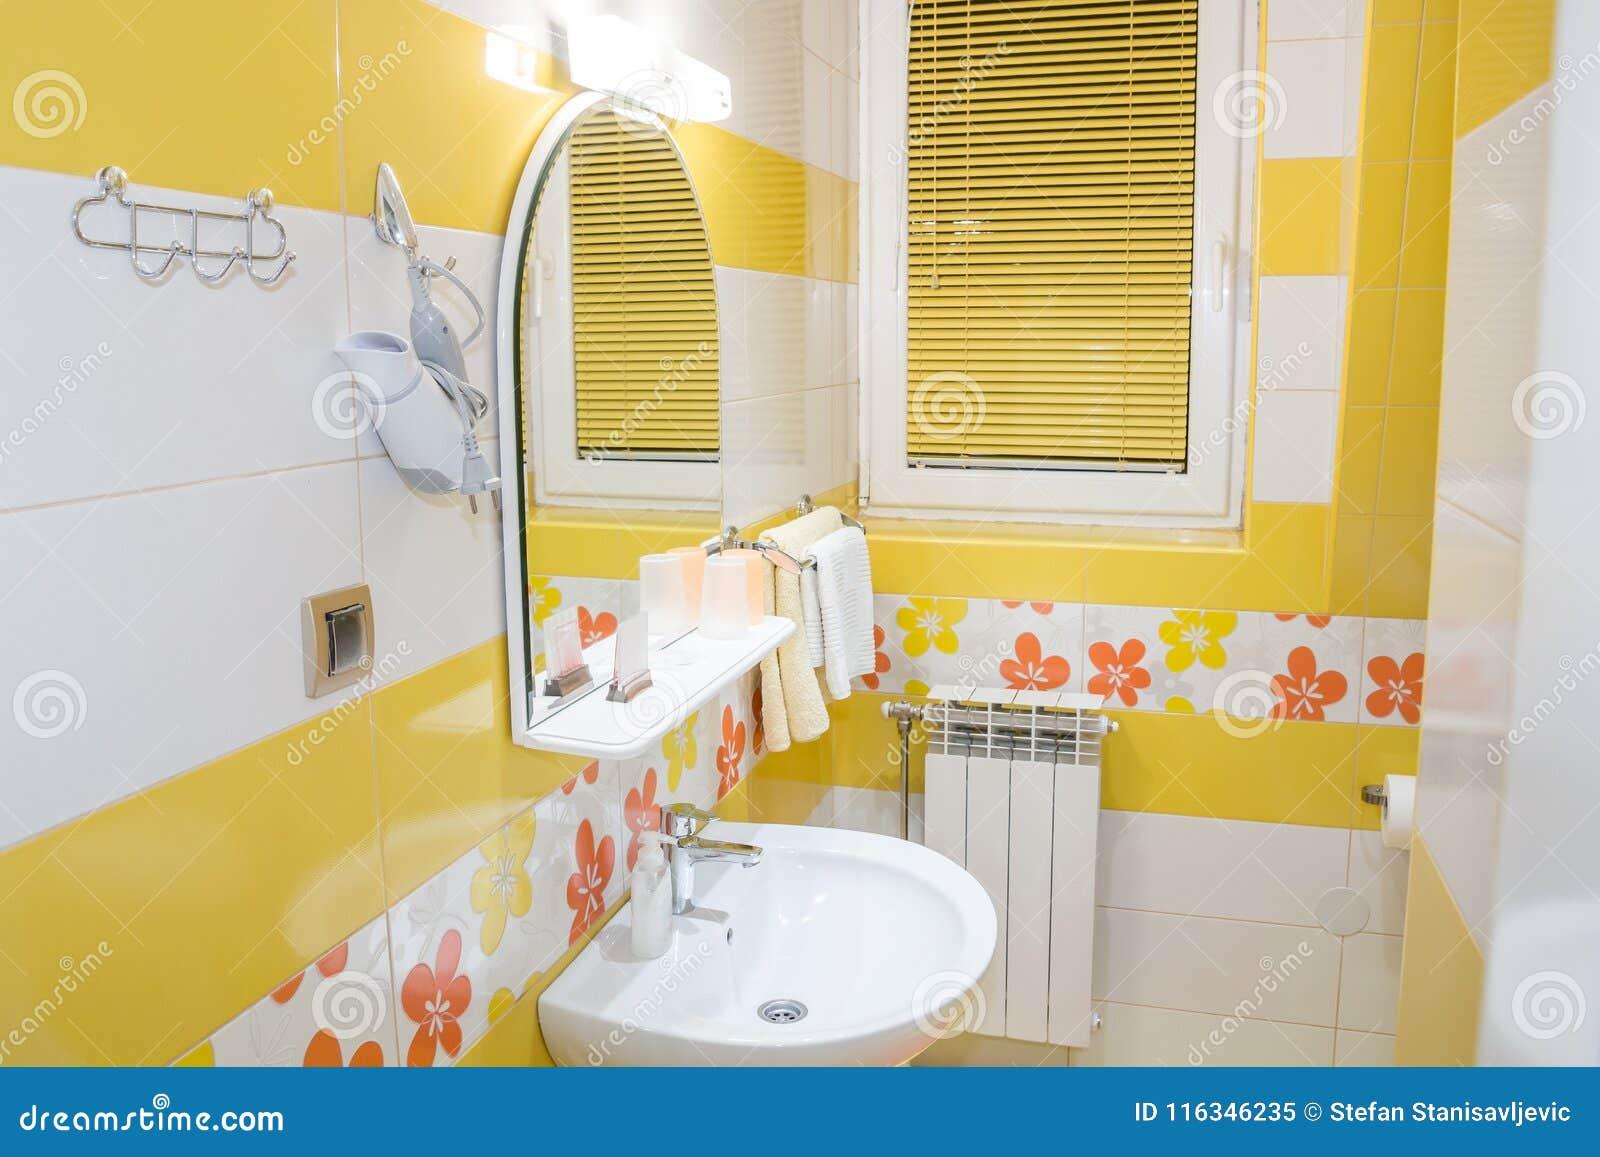 Yellow Bathroom Interior Stock Image Image Of Mirror 116346235 Download yellow bathroom decorating